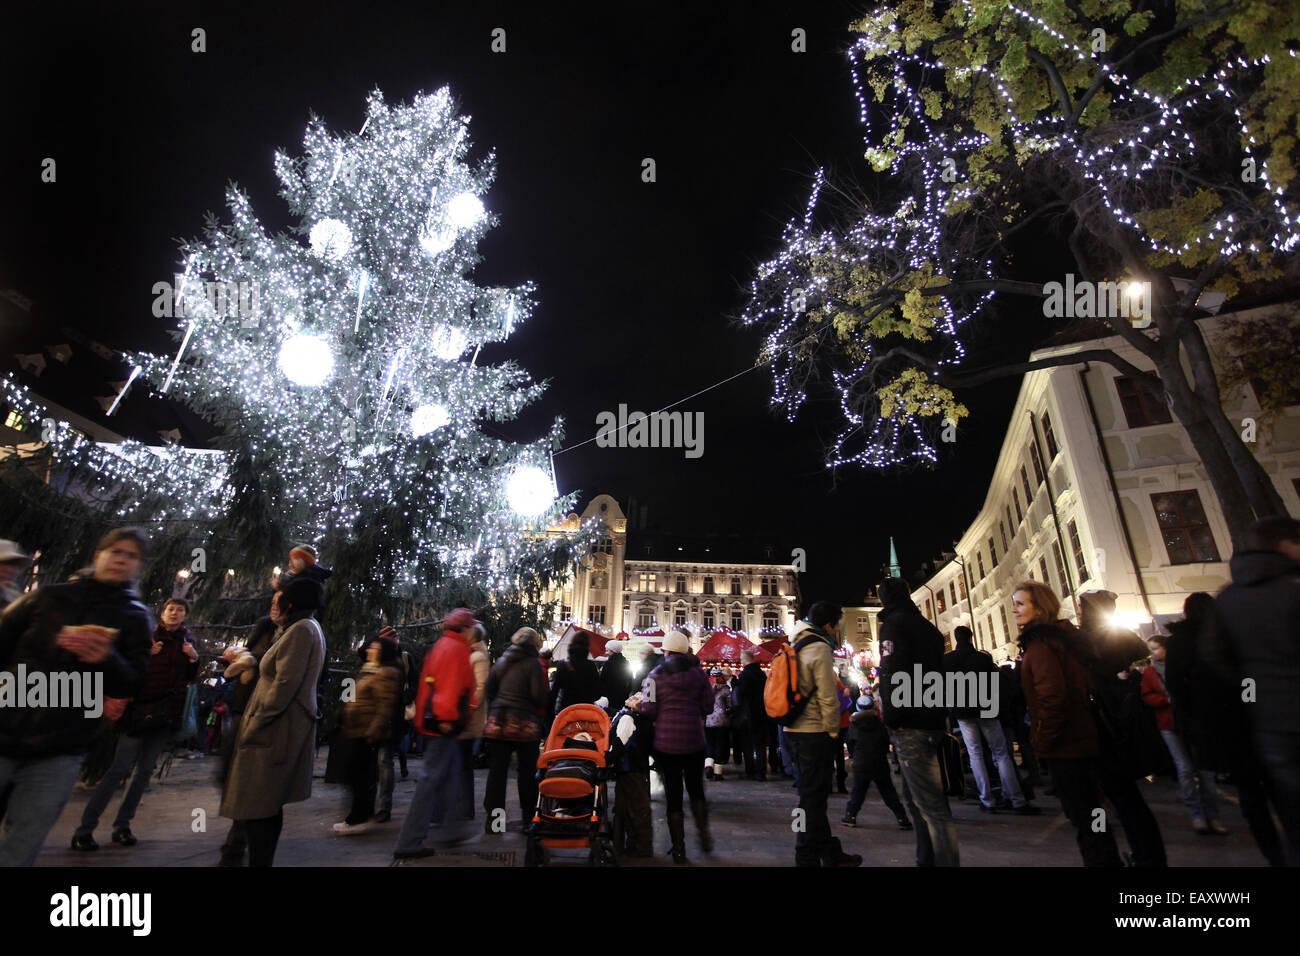 Bratislava, Slovakia. 21st Nov, 2014. Photo taken on Nov. 21, 2014 ...